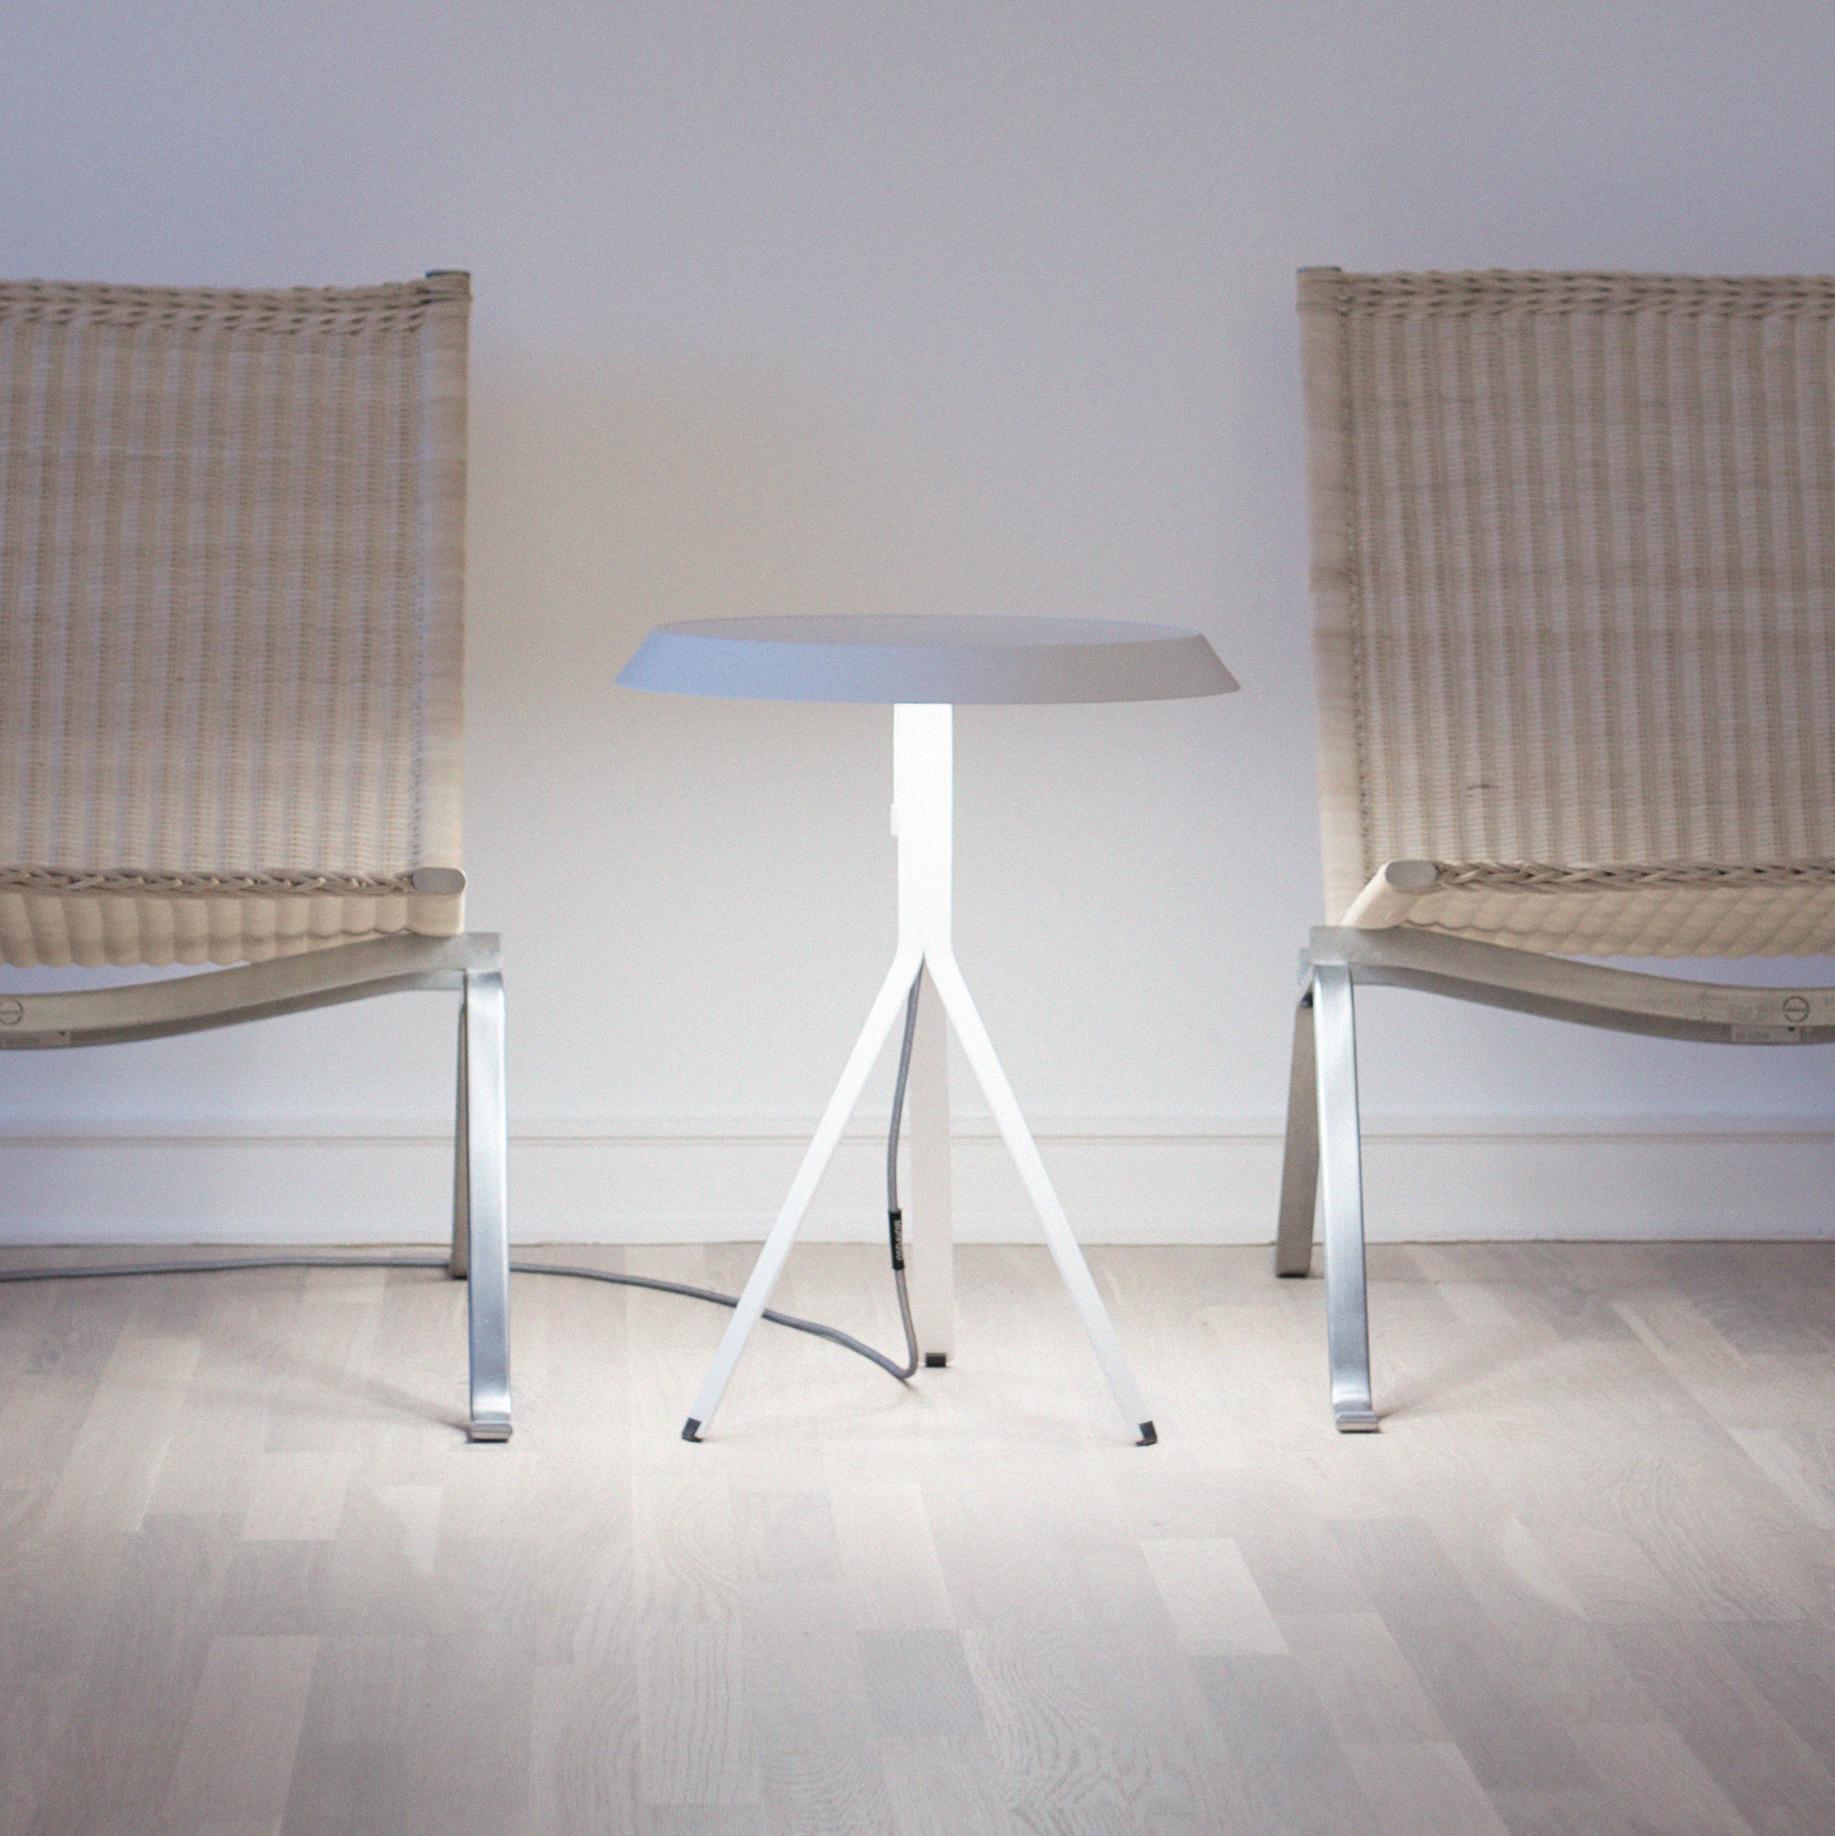 Koenig-Table-Lamp-ambience-living-room-05